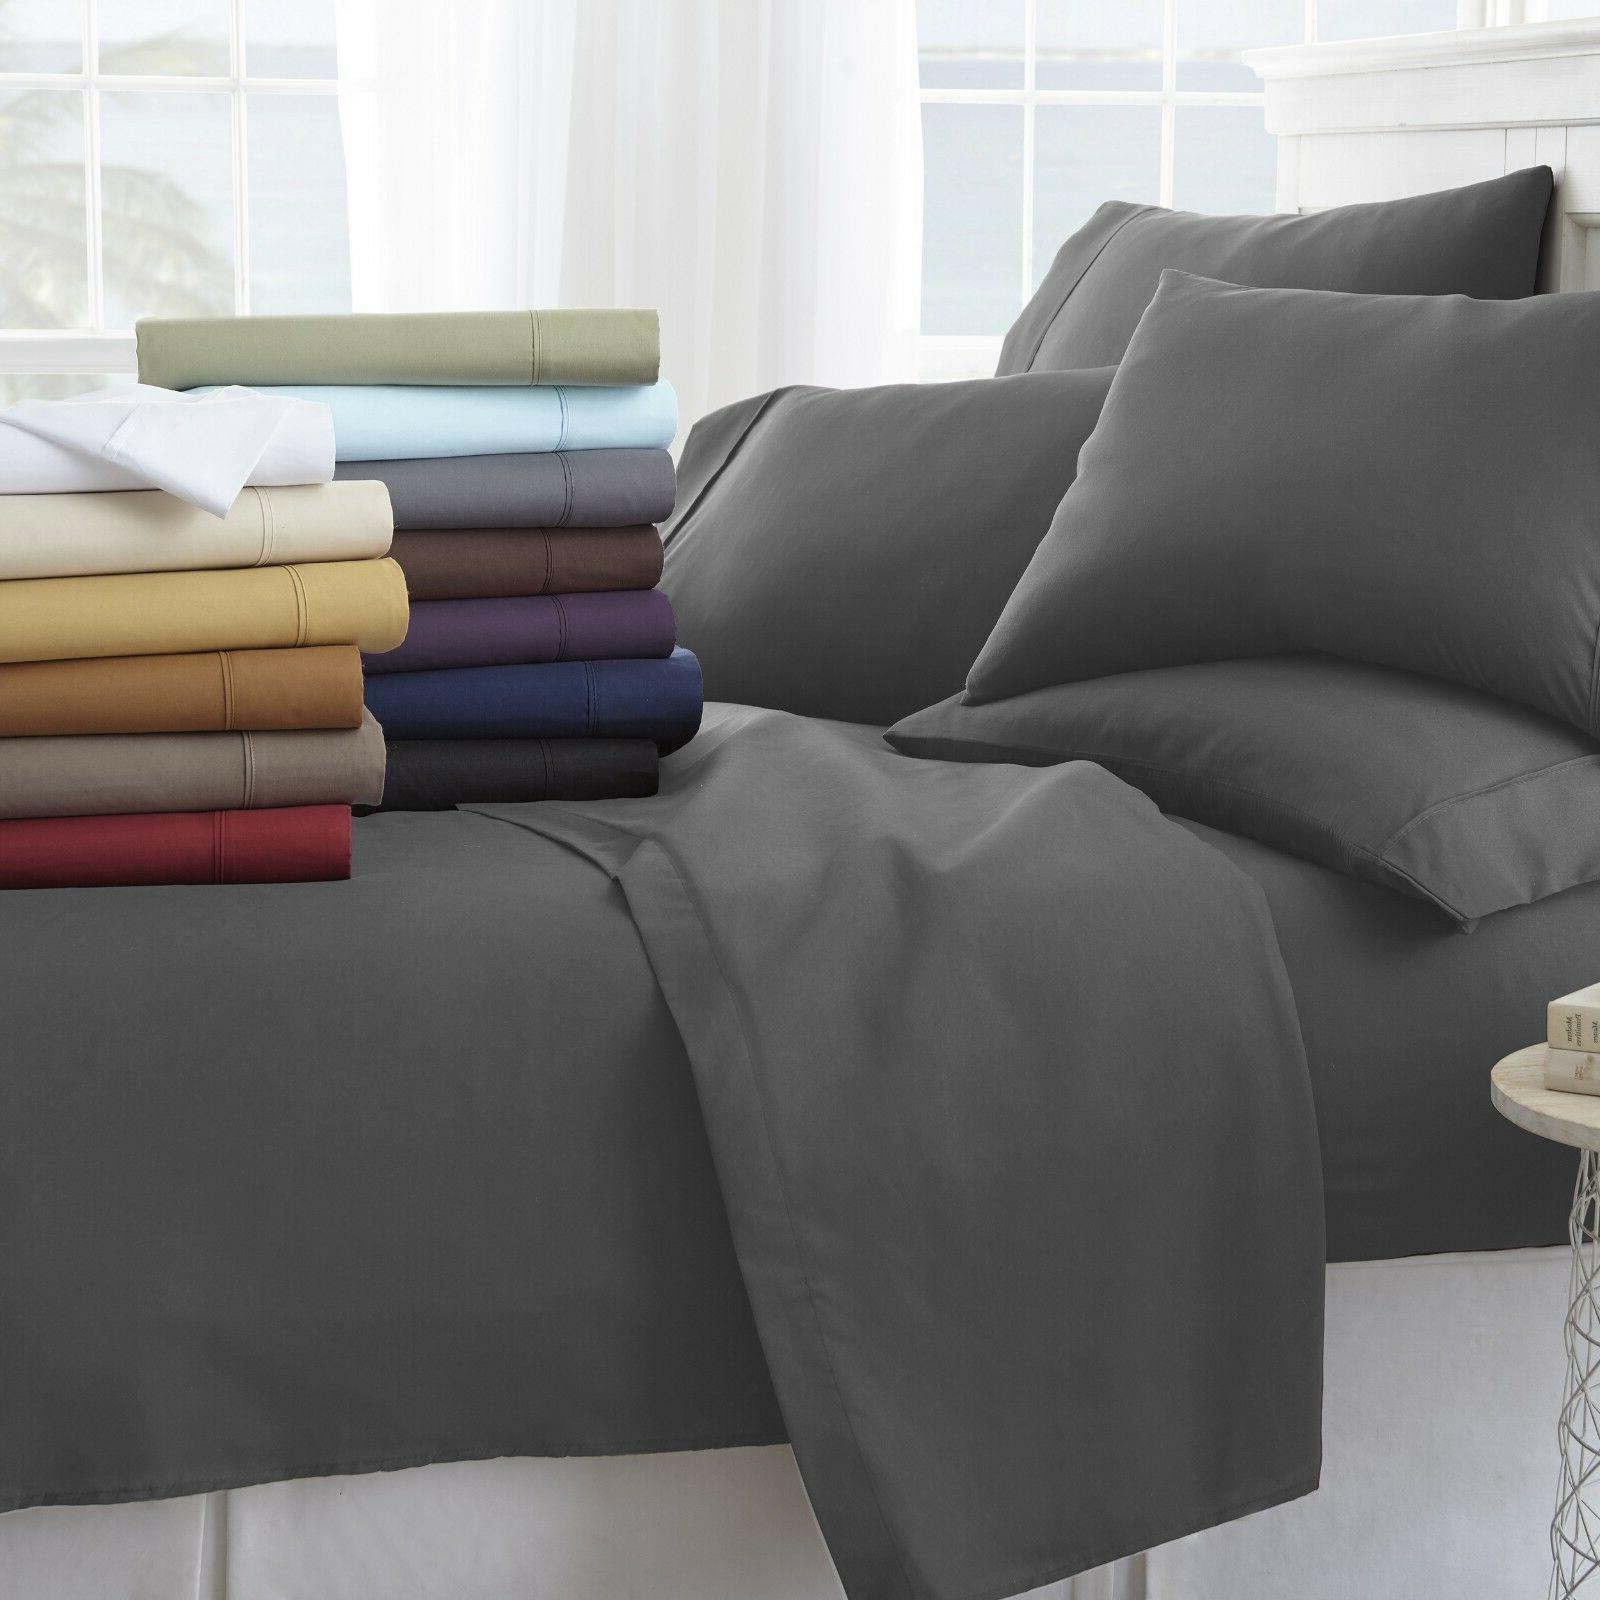 ultra soft cozy 6 piece bed sheet